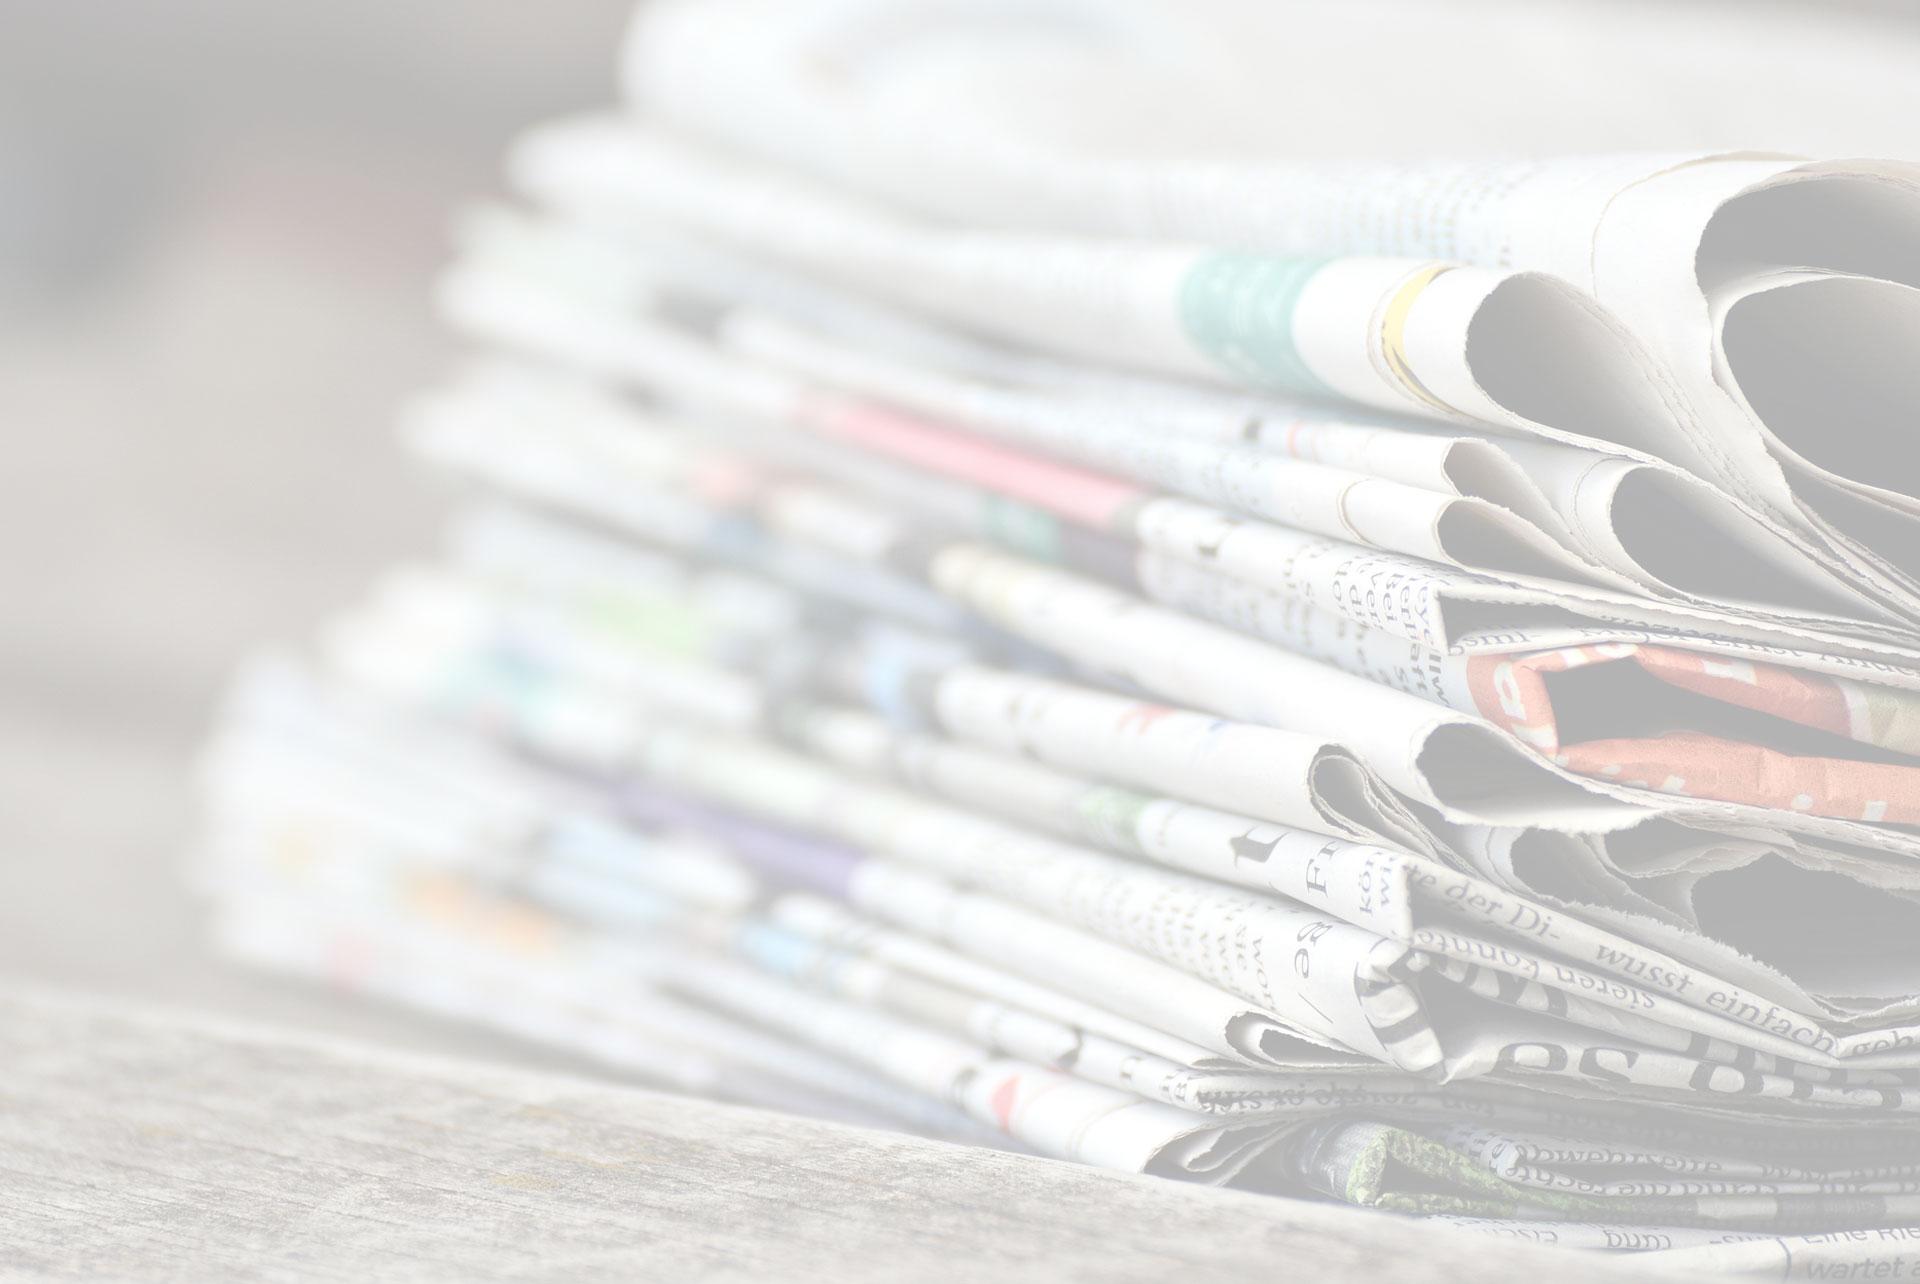 Roberto Salvini